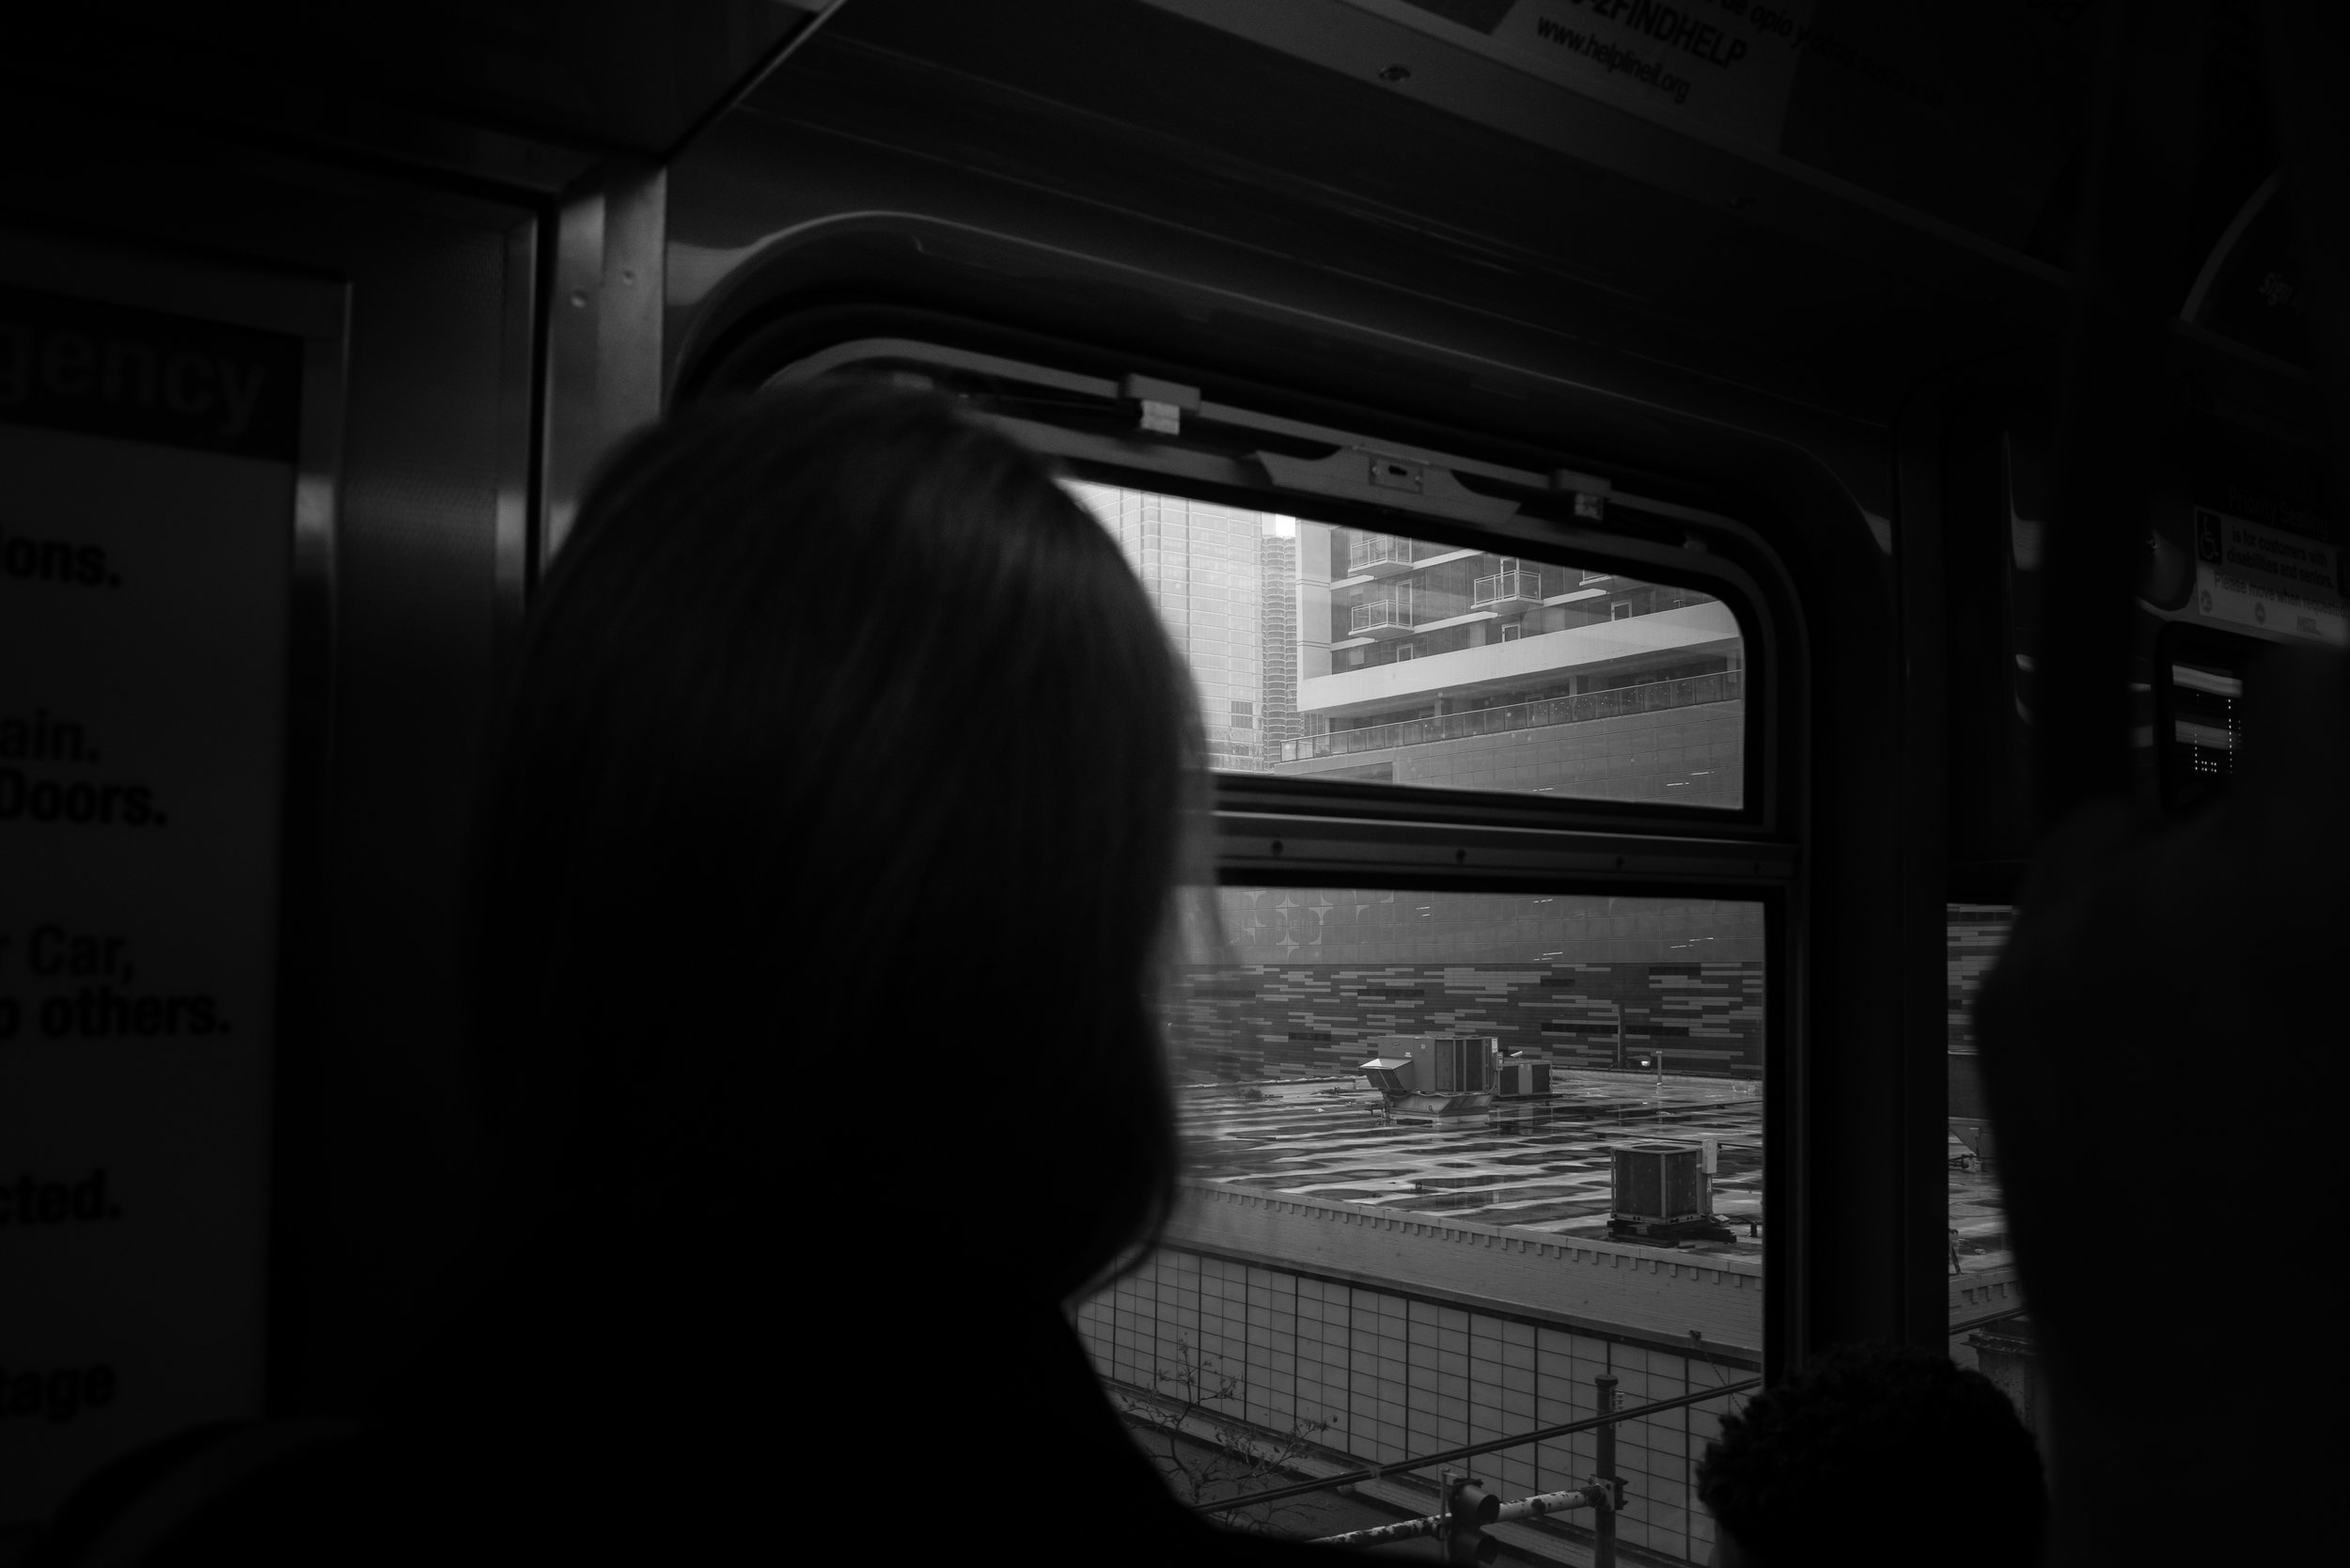 David-Olivier-Gascon-photography-chicago-studiod-montreal--07923.jpg